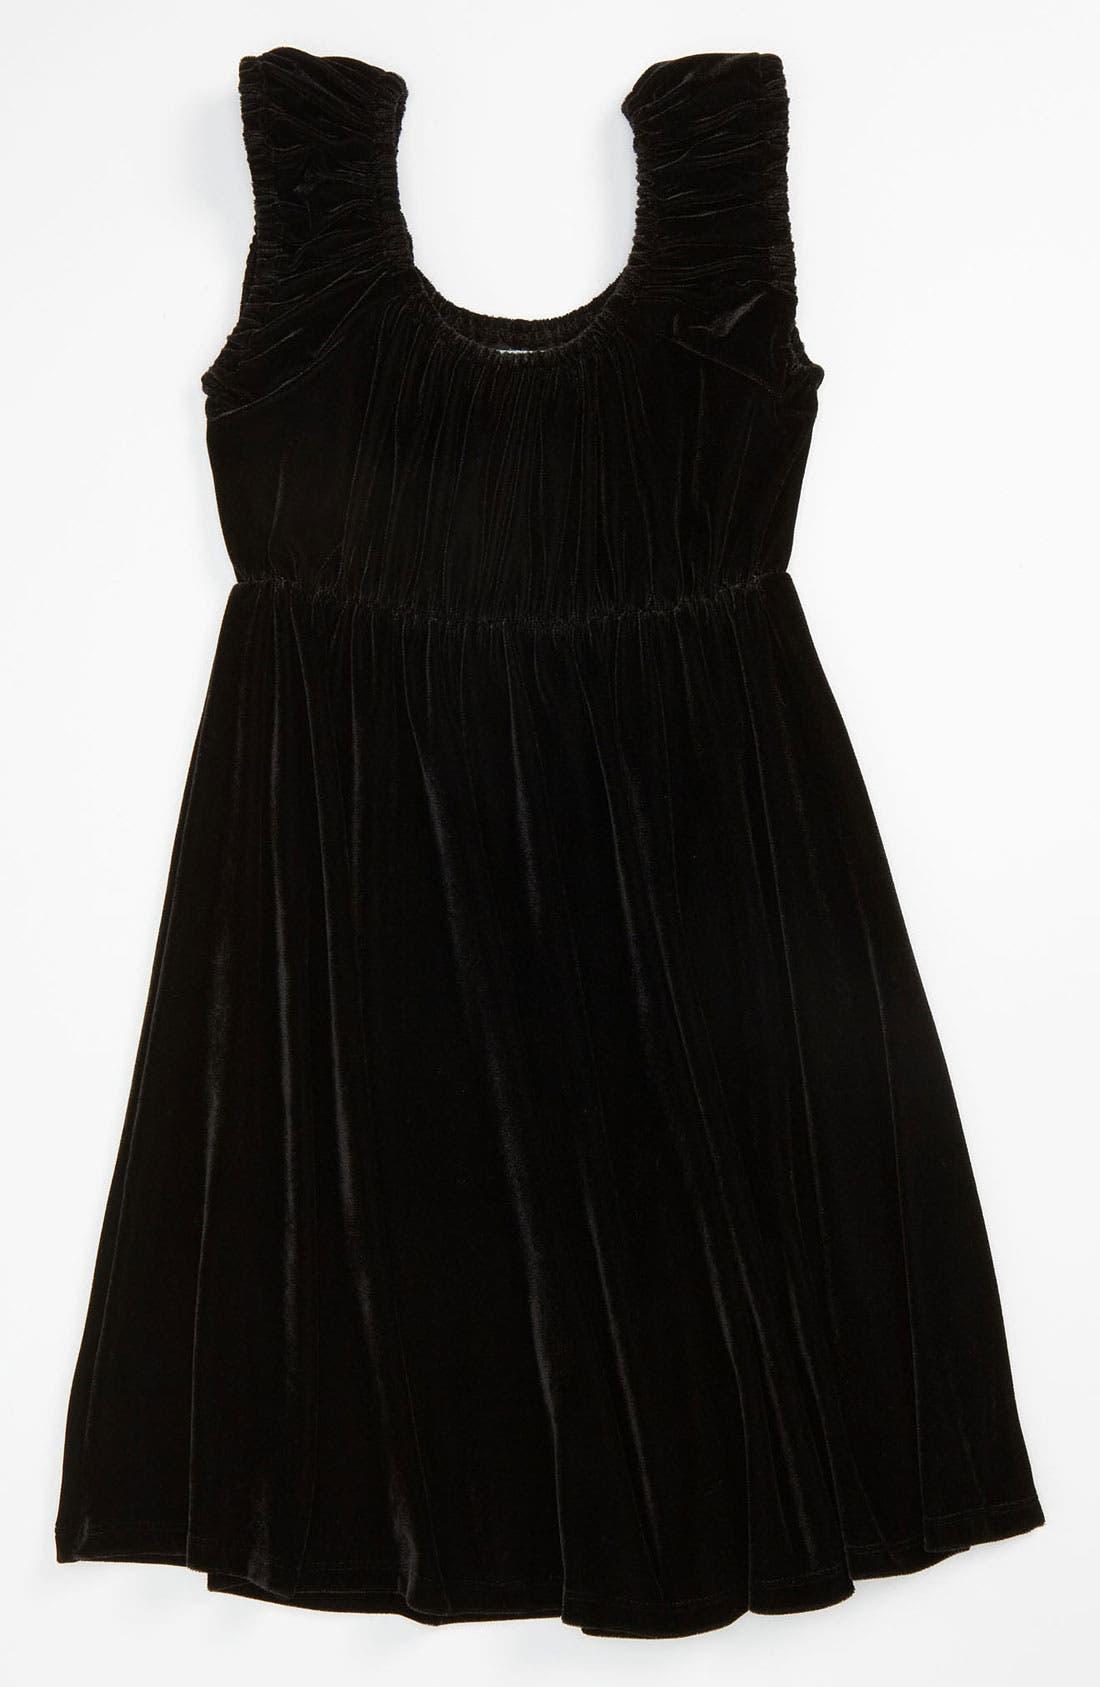 Alternate Image 1 Selected - Peek 'Kate' Dress (Toddler, Little Girls & Big Girls)